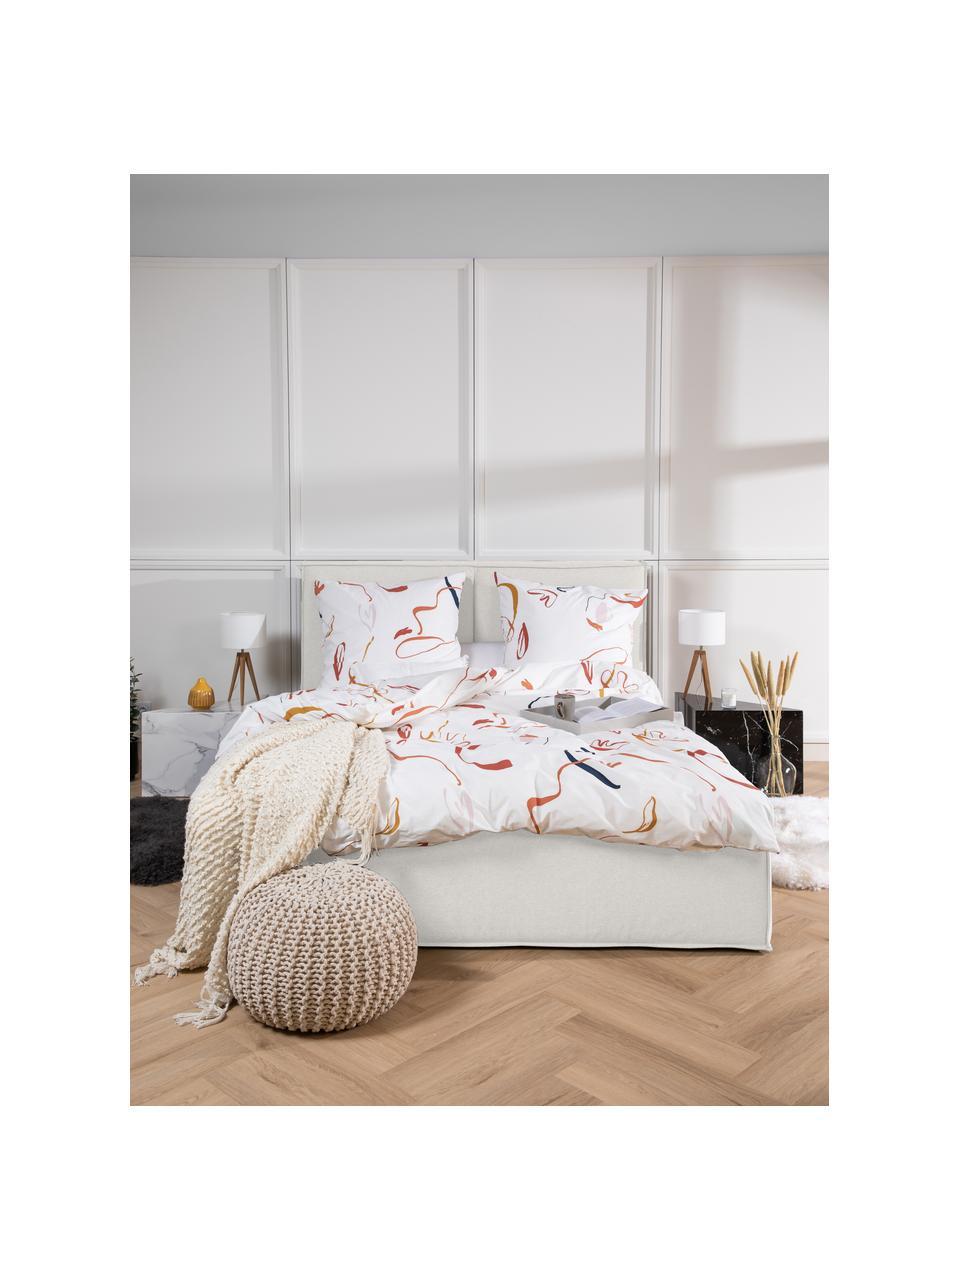 Gestoffeerd bed Dream in crèmewit, Frame: massief grenenhout en pla, Bekleding: 100% polyester (gestructu, Geweven stof crèmewit, 180 x 200 cm